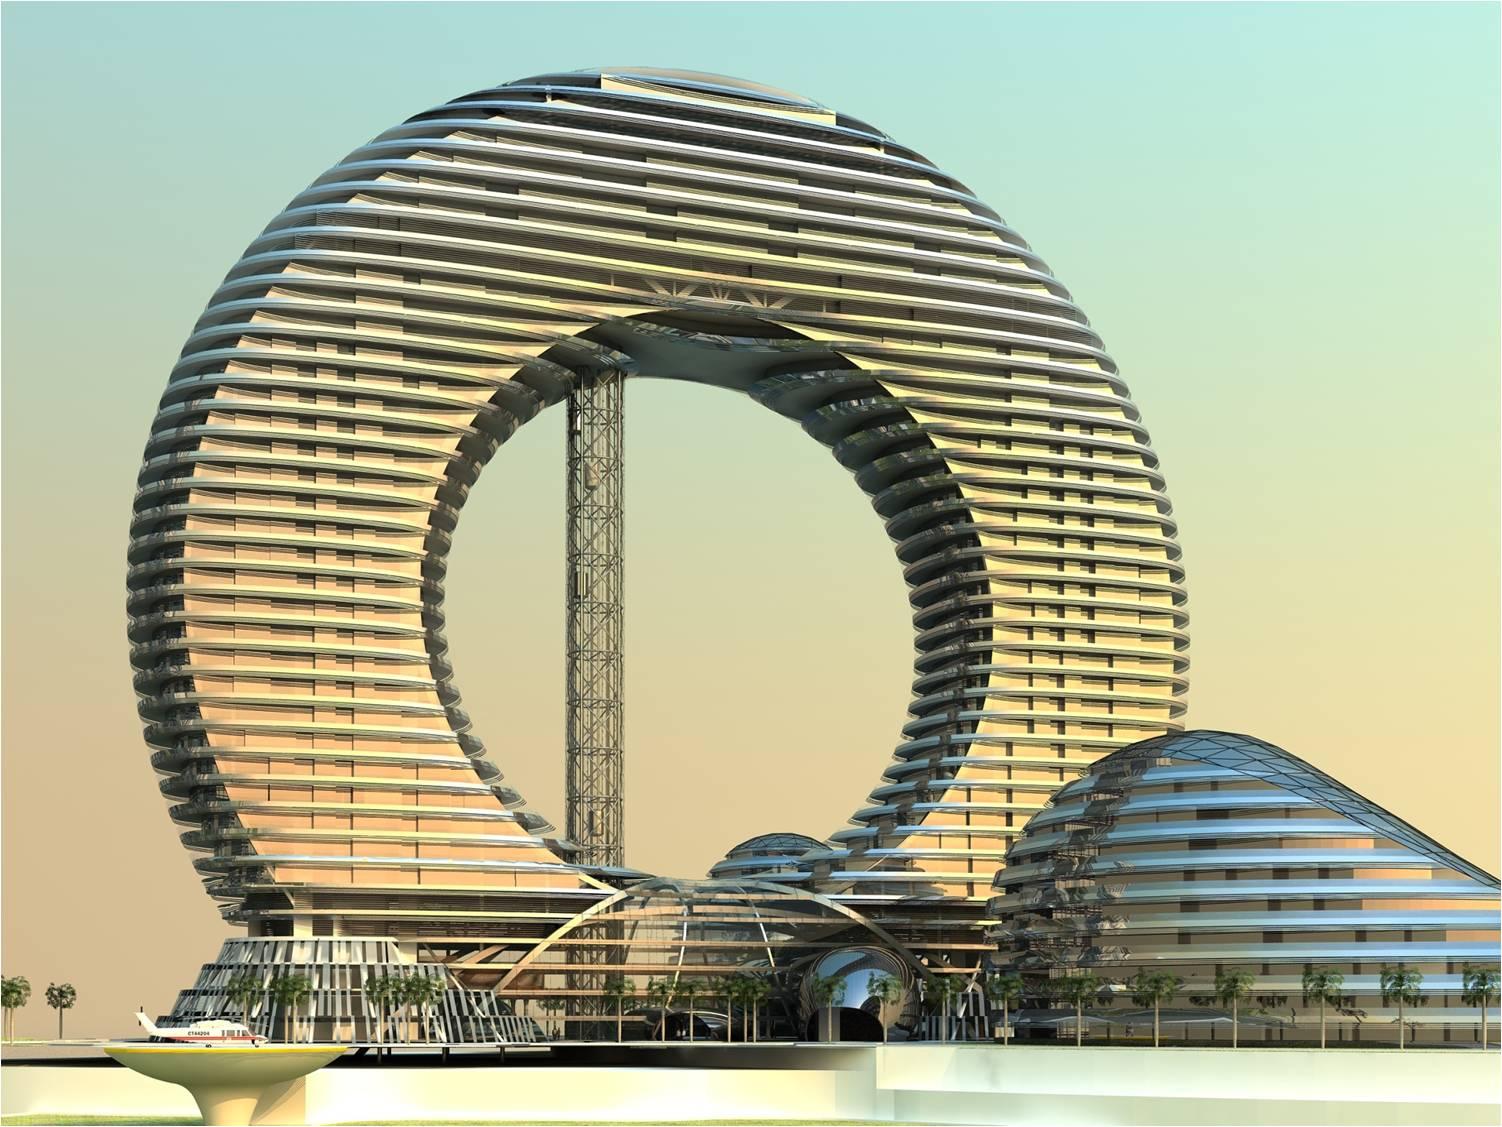 Lae international hotel clipart jpg transparent Where Is Dubai Located - Quantum Computing jpg transparent